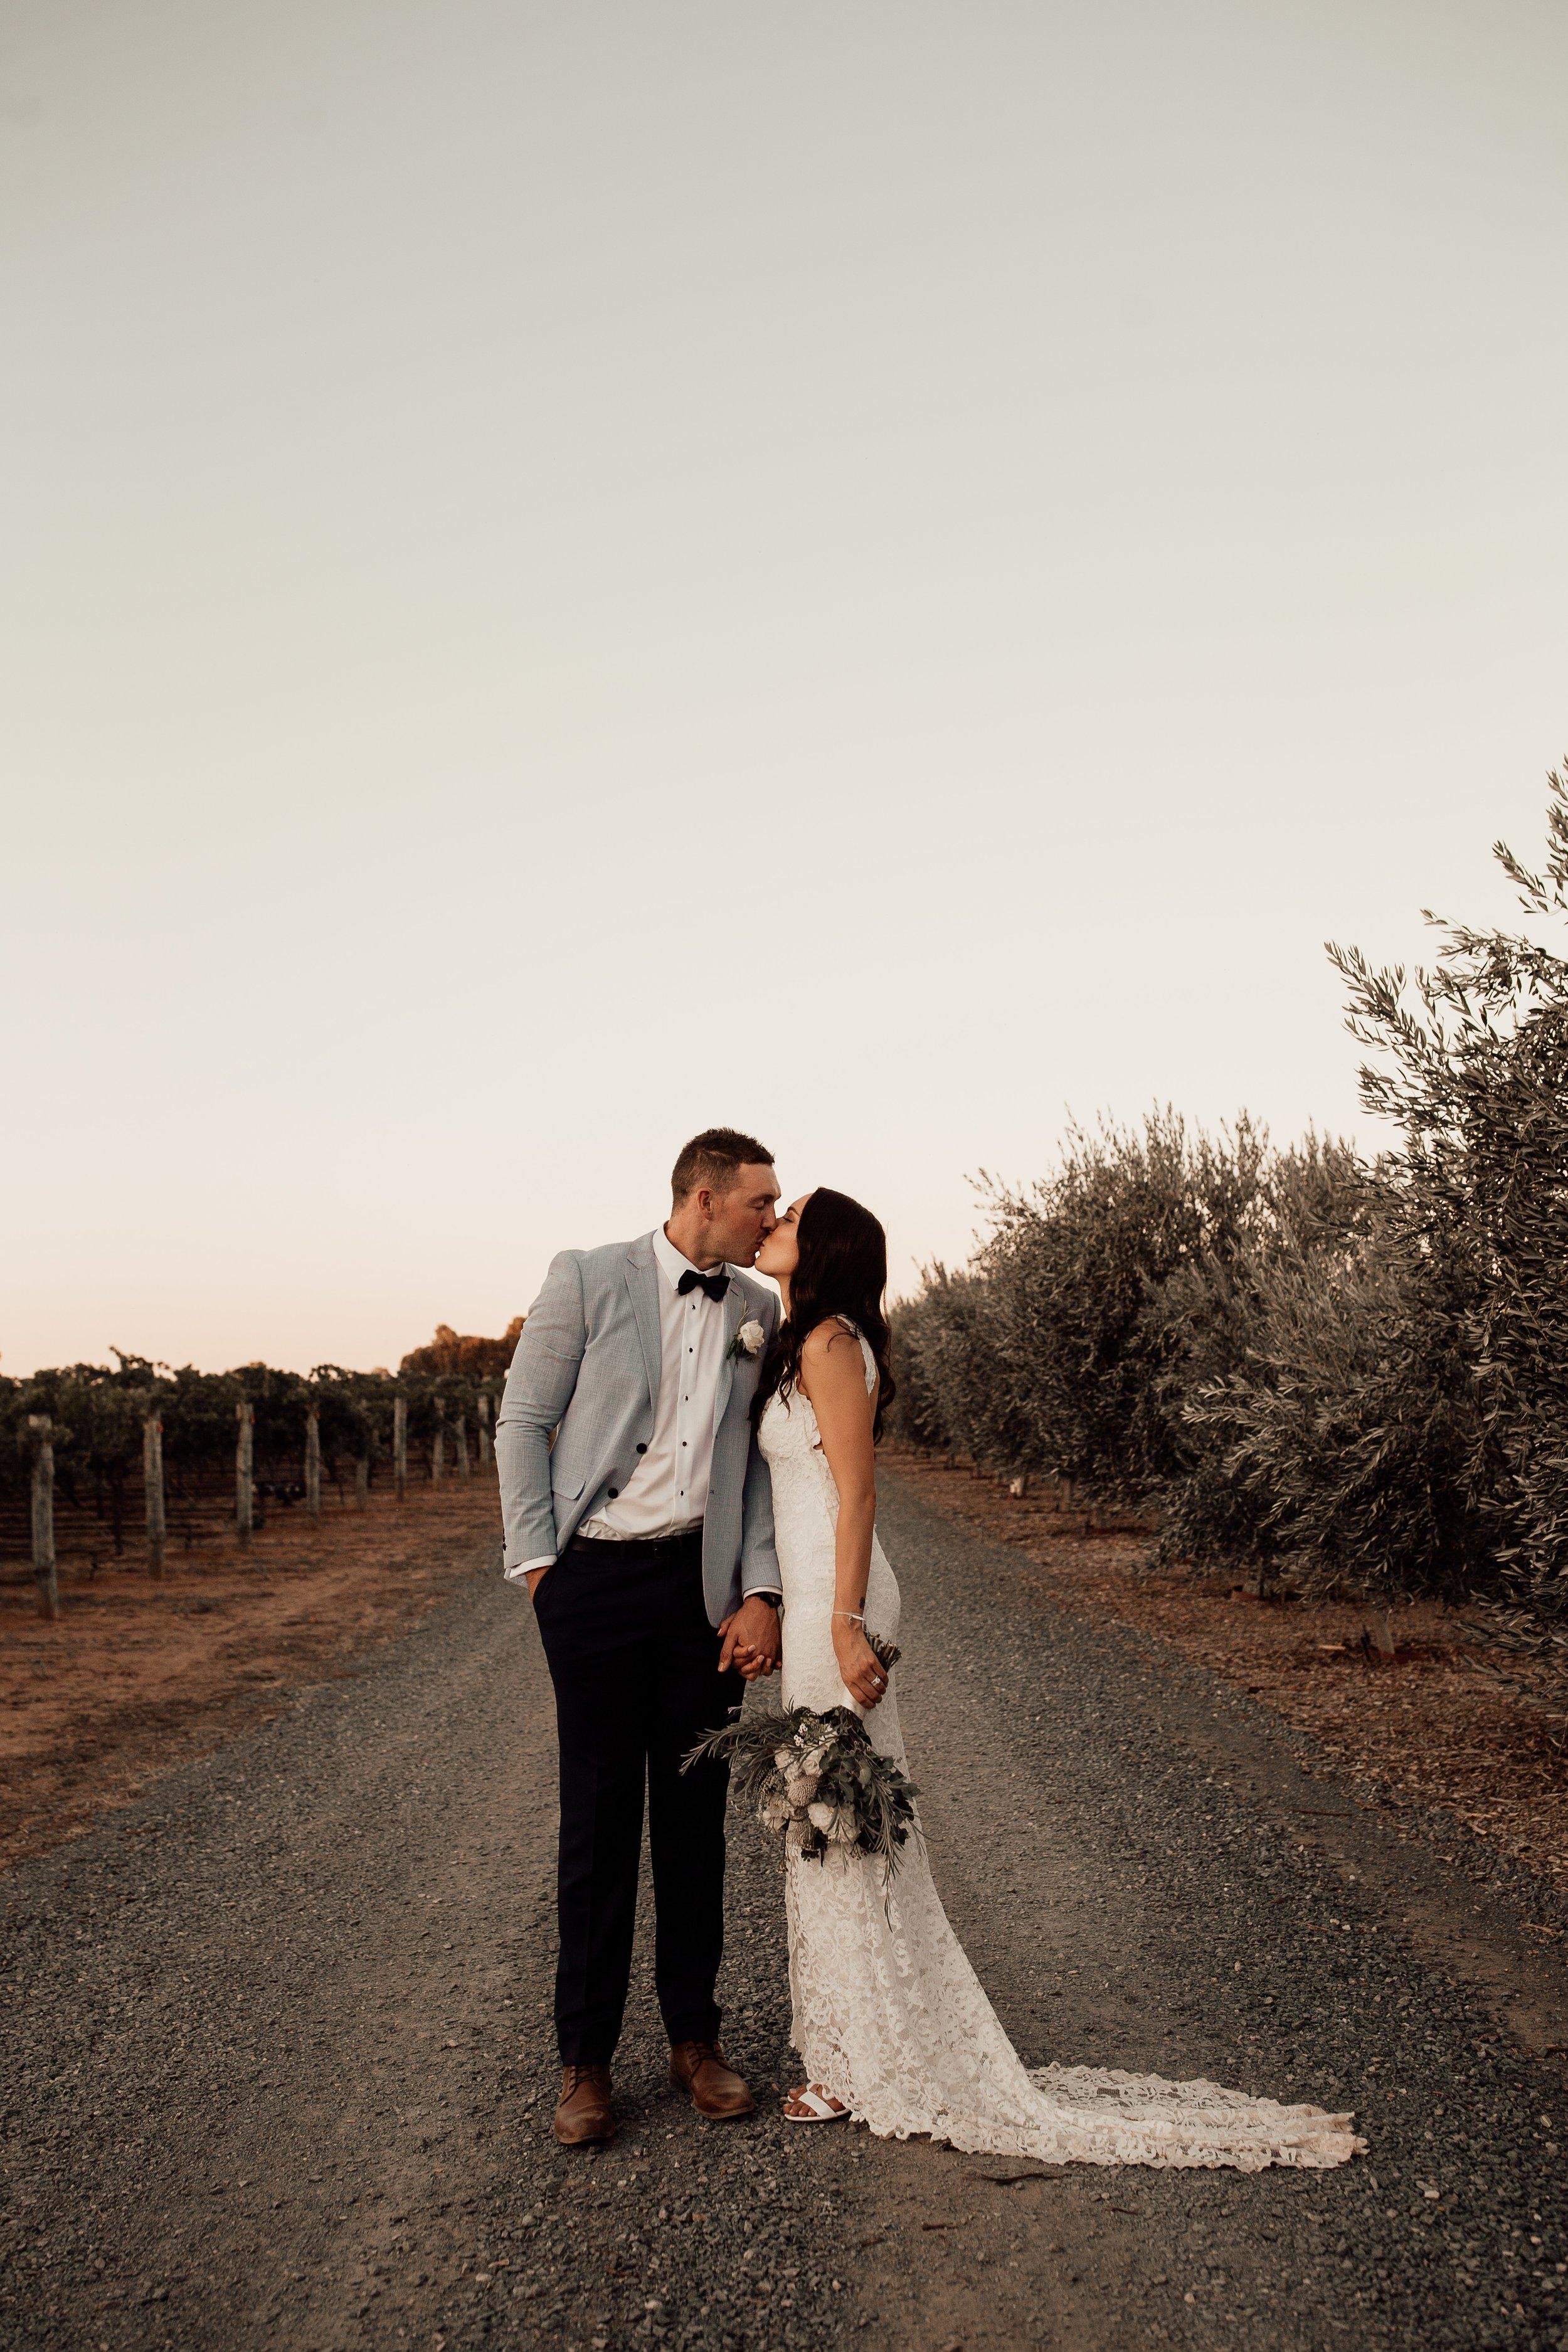 mickalathomas_puremacphotography_weddingphotographer_couplephotographer_Sheppartonphotographer_1473.jpg